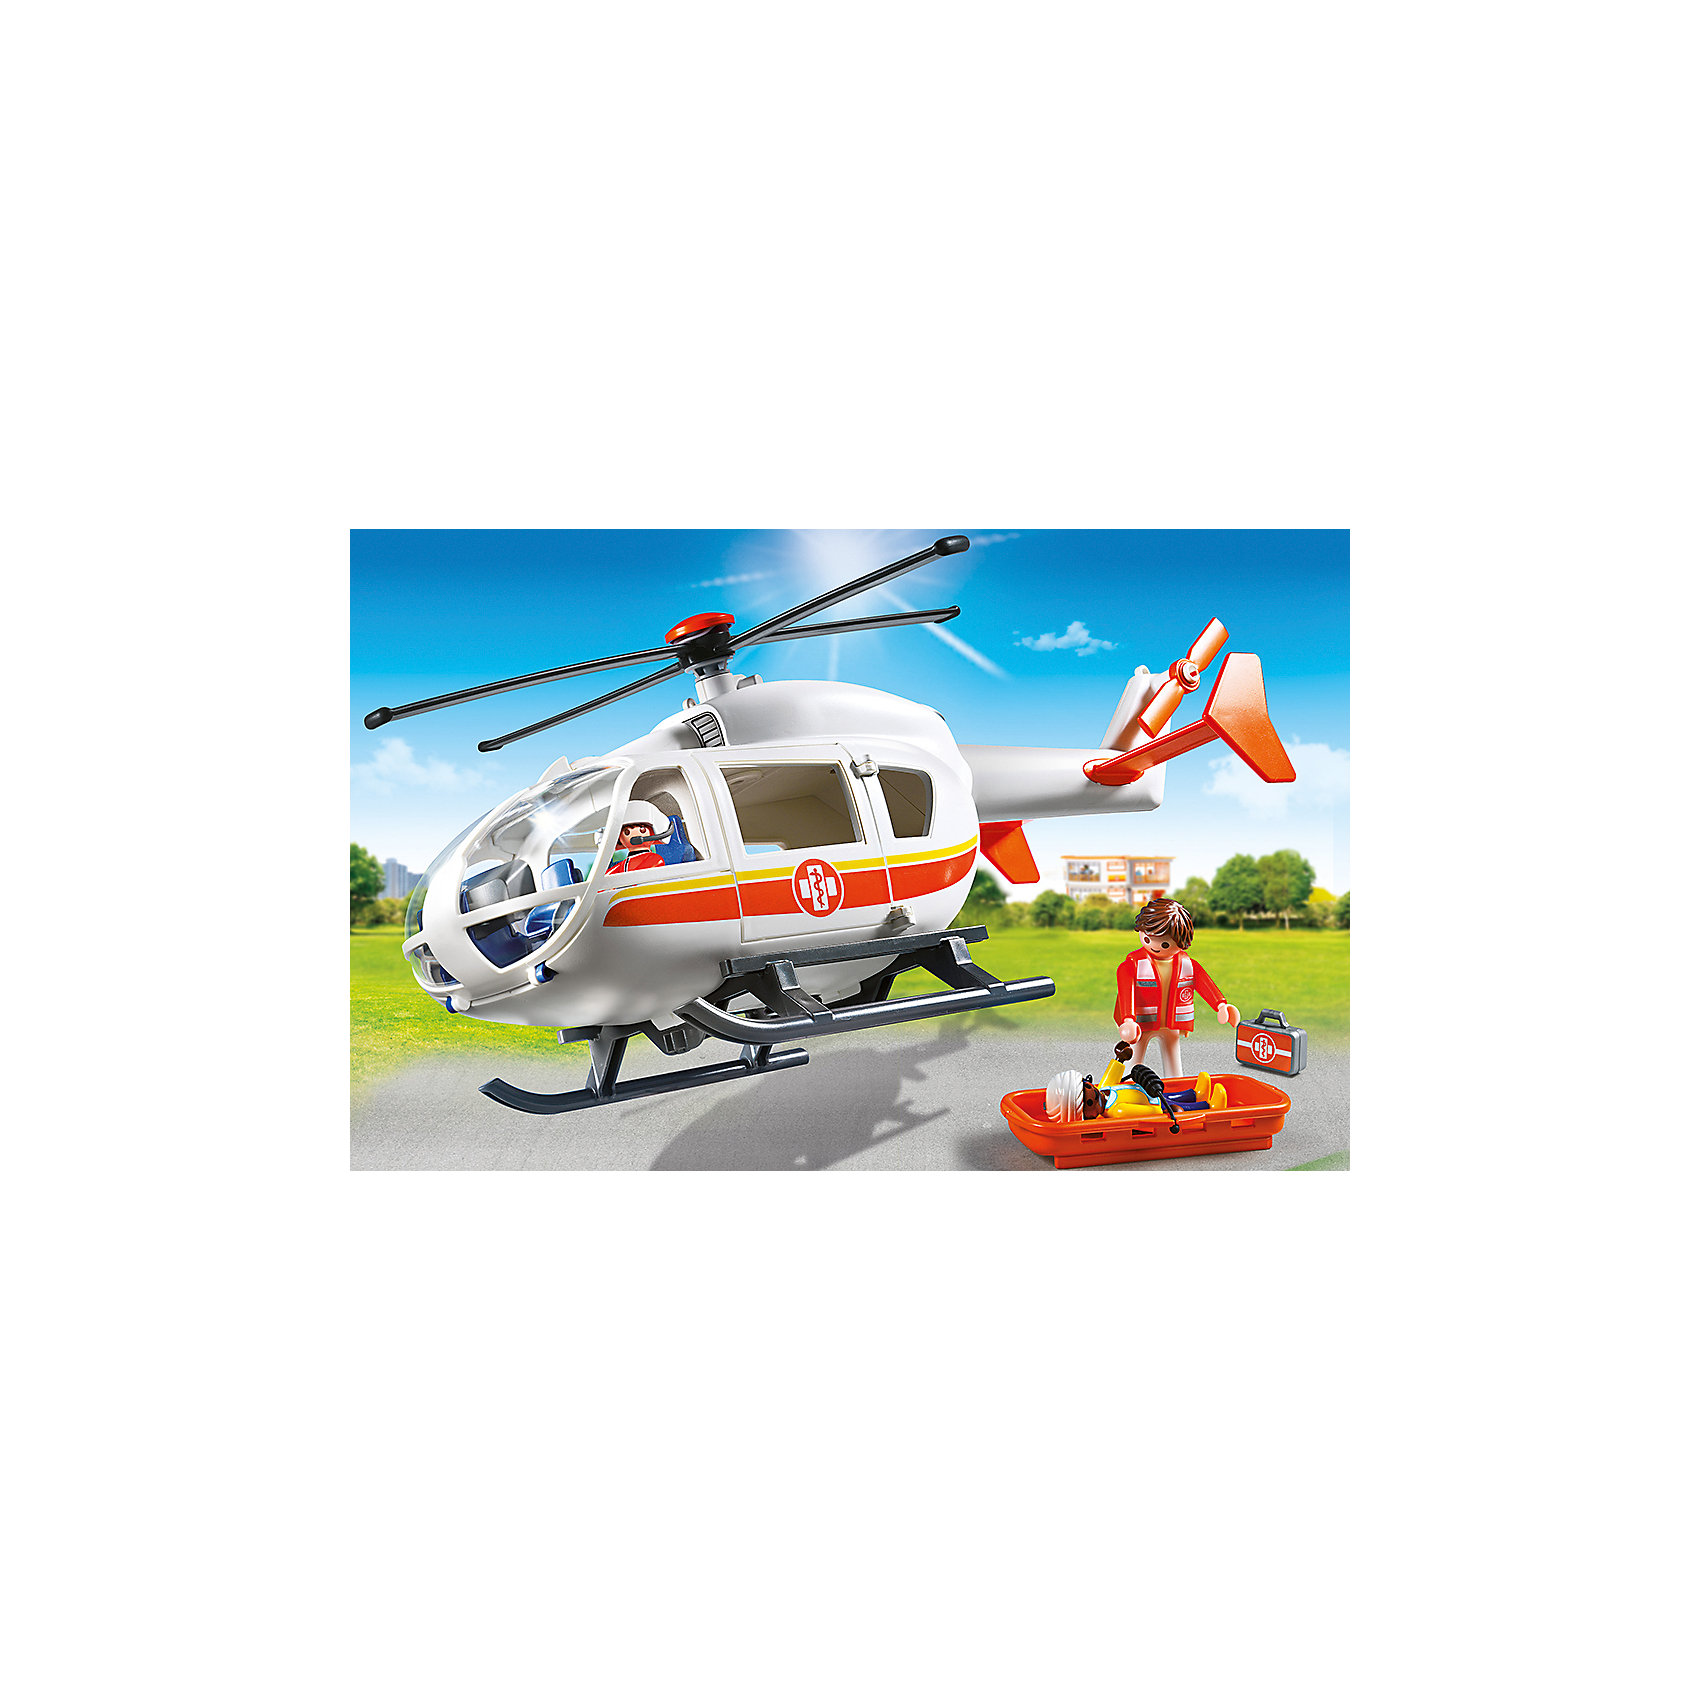 Детская клиника: Вертолет скорой помощи, PLAYMOBIL<br><br>Ширина мм: 387<br>Глубина мм: 248<br>Высота мм: 129<br>Вес г: 652<br>Возраст от месяцев: 48<br>Возраст до месяцев: 120<br>Пол: Унисекс<br>Возраст: Детский<br>SKU: 4012470